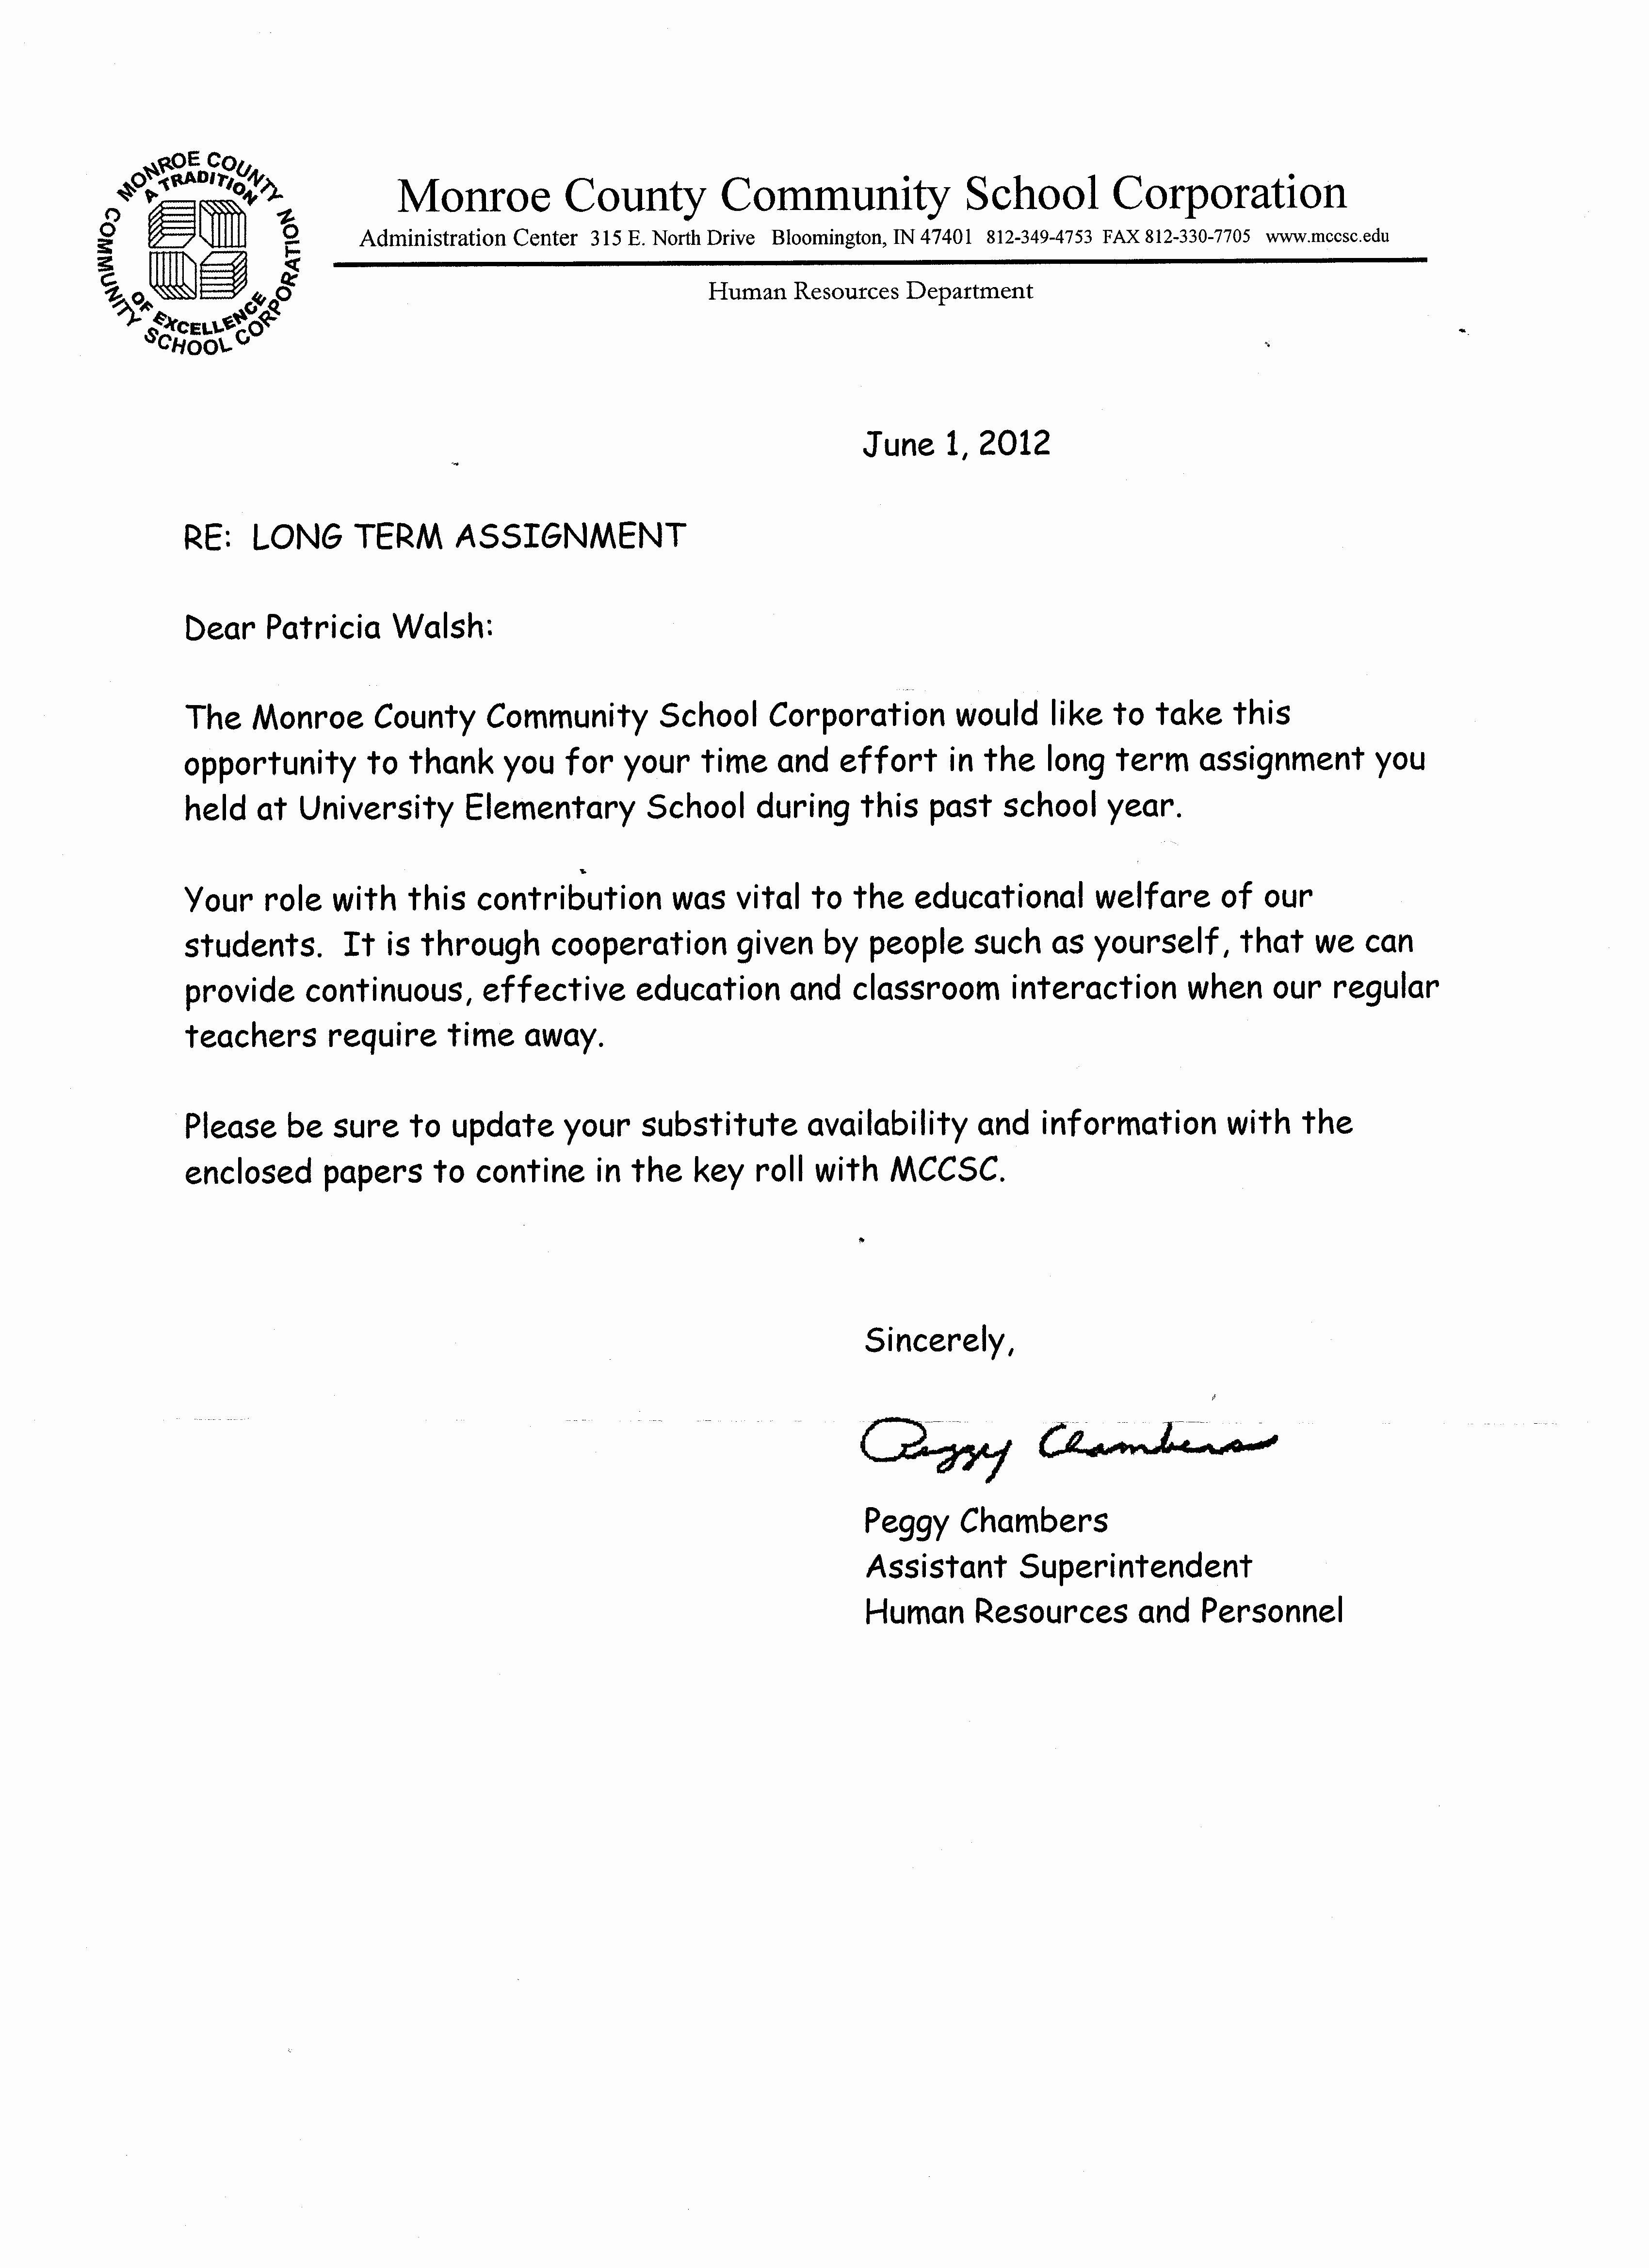 Teaching Letter Of Recommendation Unique Evaluations Re Mendations Patti Walsh S Teaching Portfolio